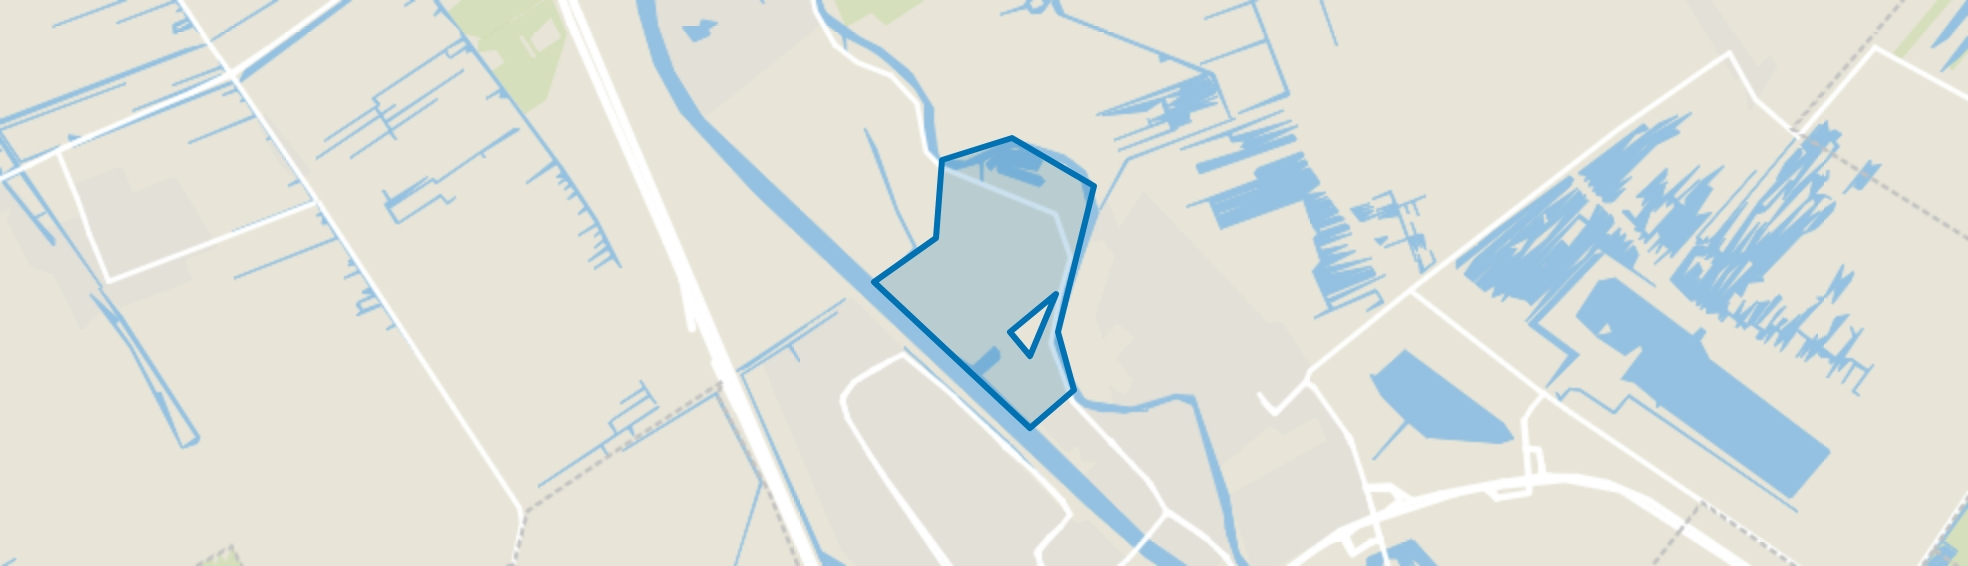 Otterspoorbroek, Maarssen map